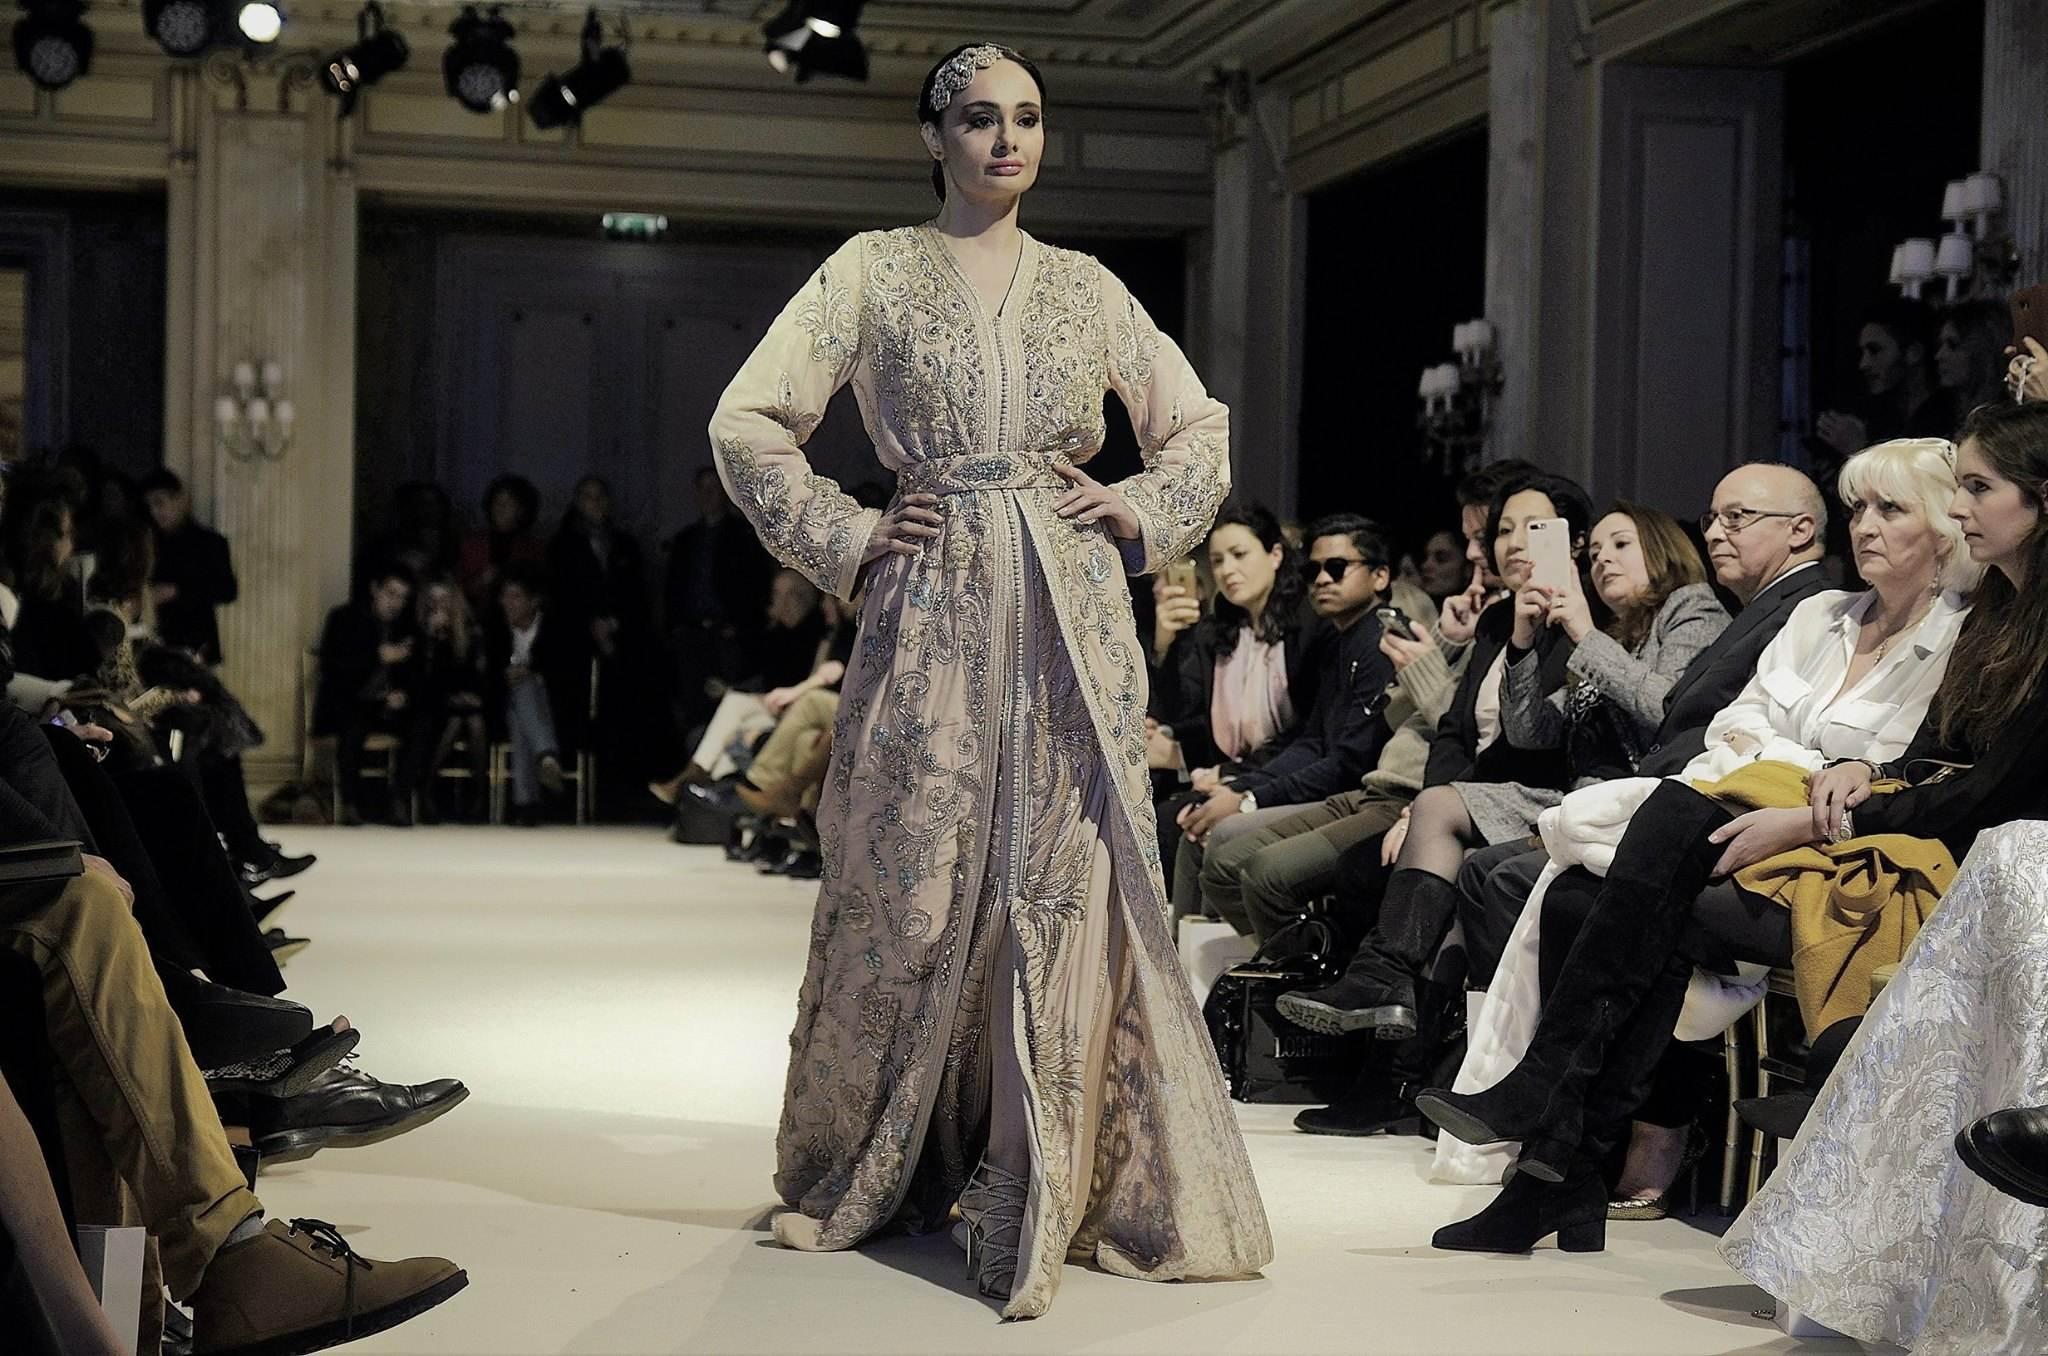 Paris Haute Couture Fashion Week - Filali Couture